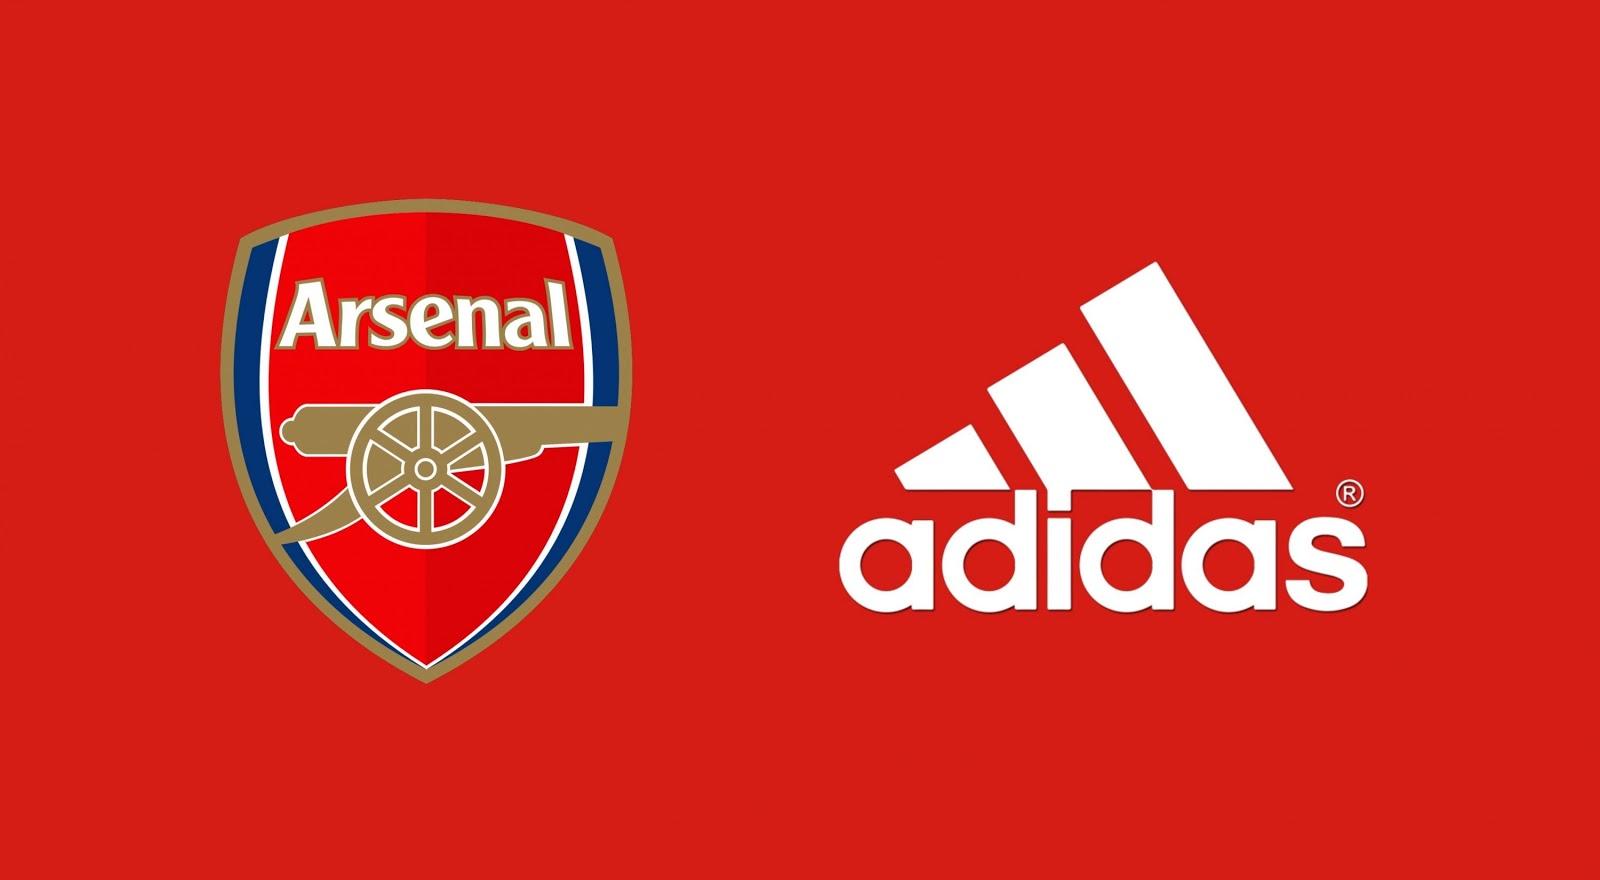 Adidas Arsenal 2019 2020